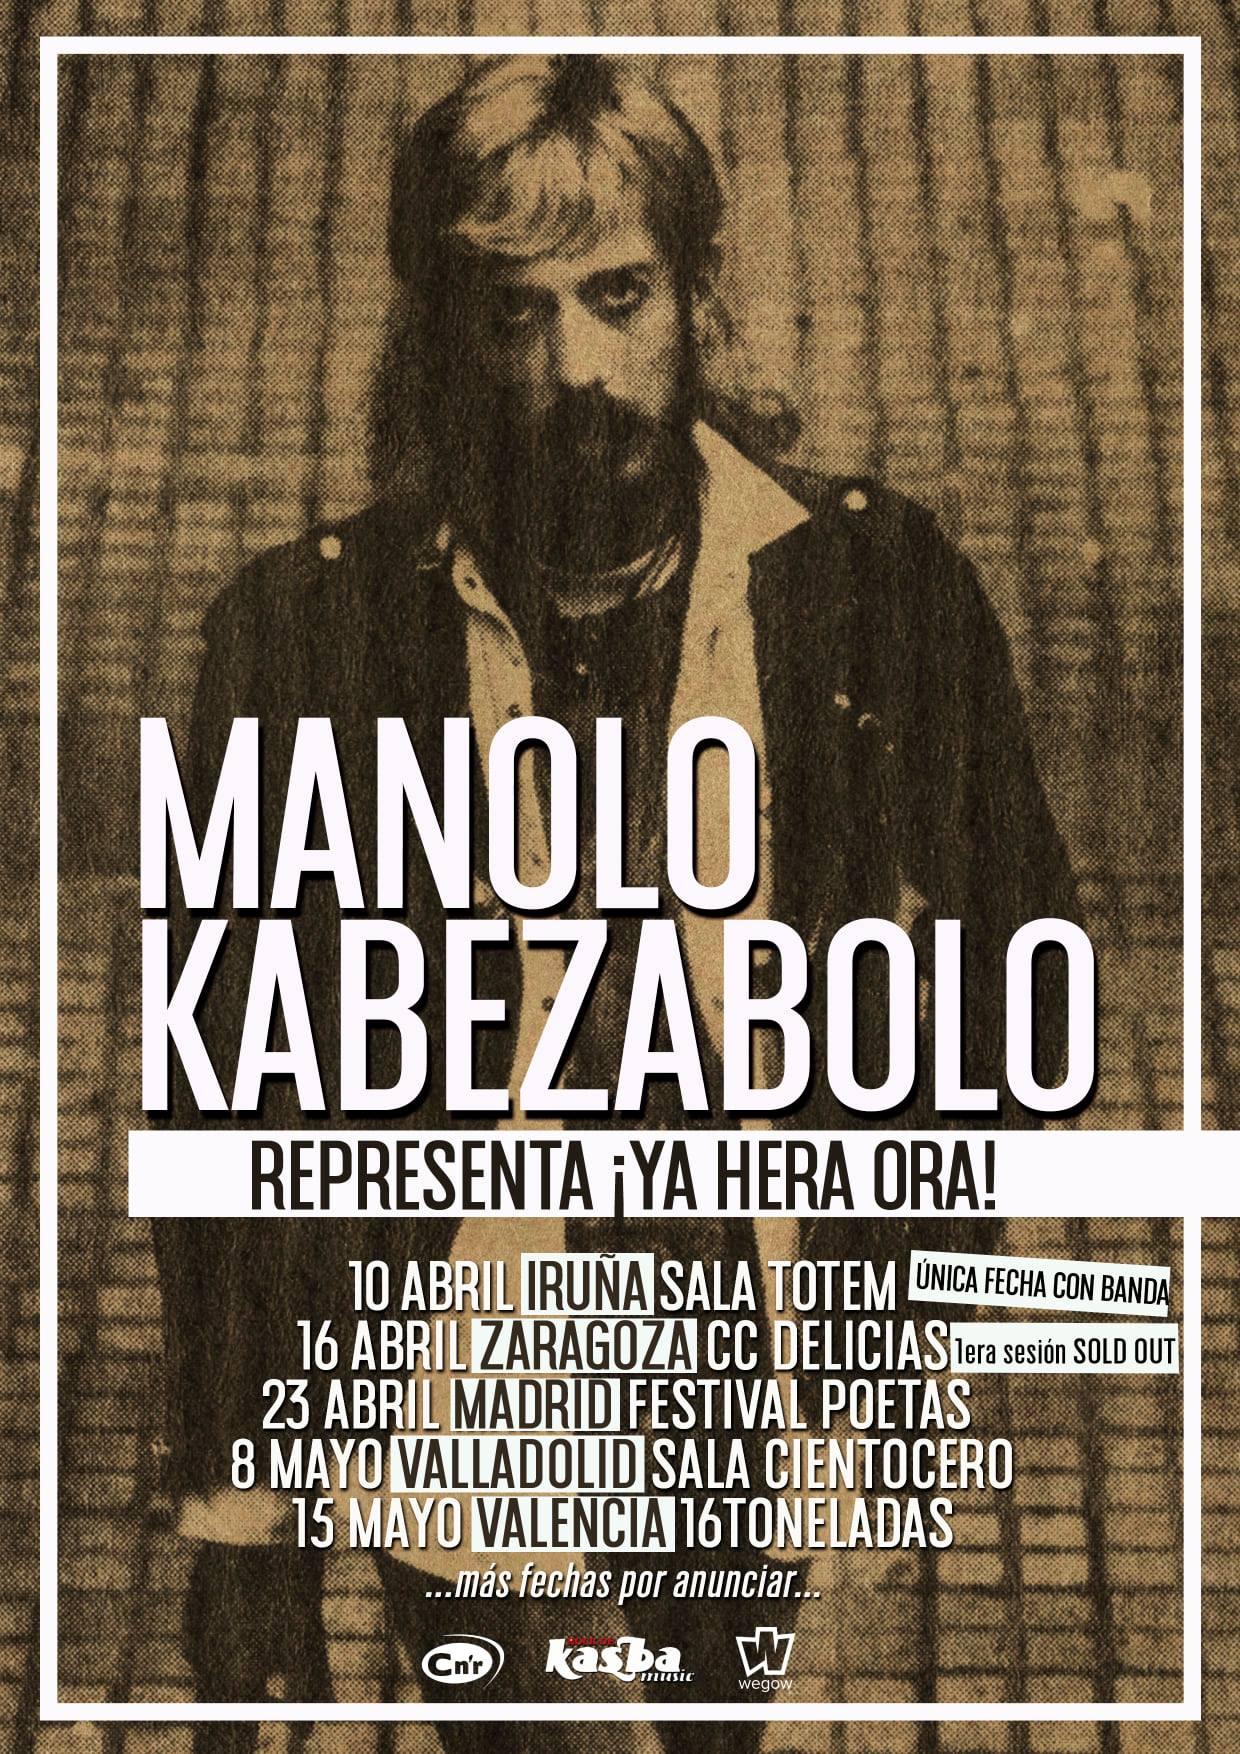 MANOLO KABEZABOLO – FECHAS DE SU GIRA PRESENTANDO LA REEDICION DE ¡YA HERA ORA!